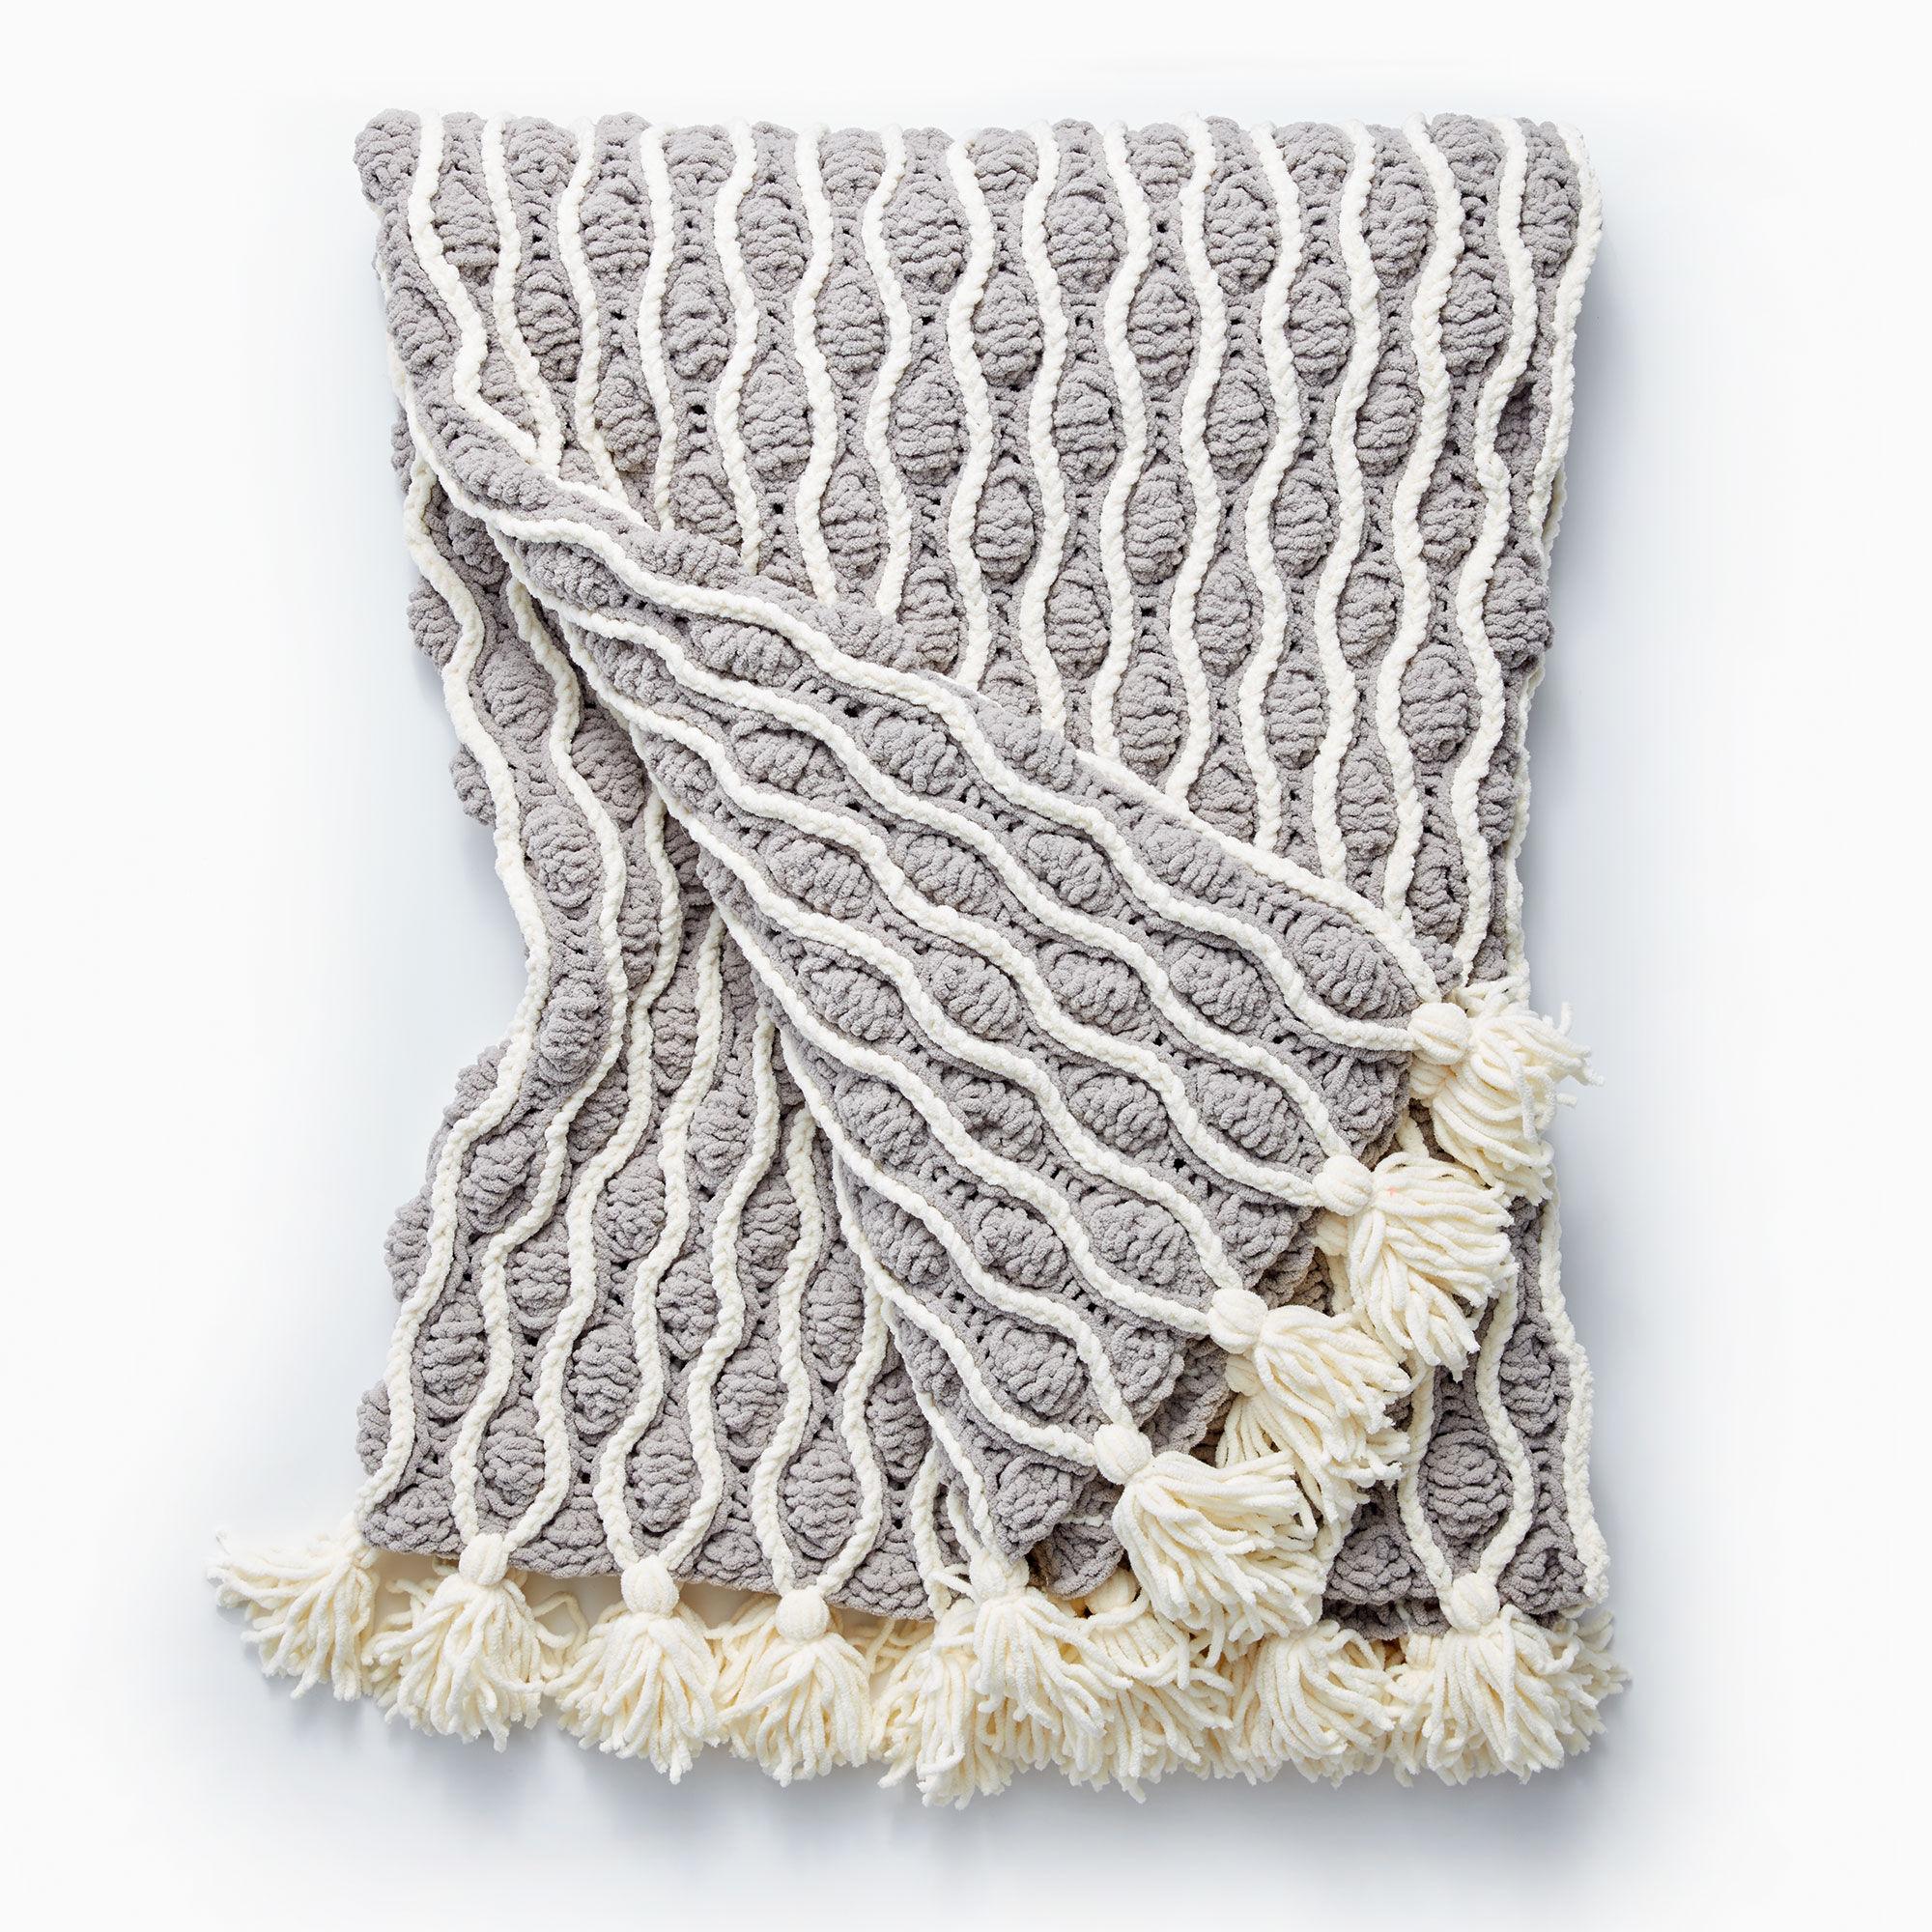 Bernat Trellis & Tassels Knit Afghan | Yarnspirations